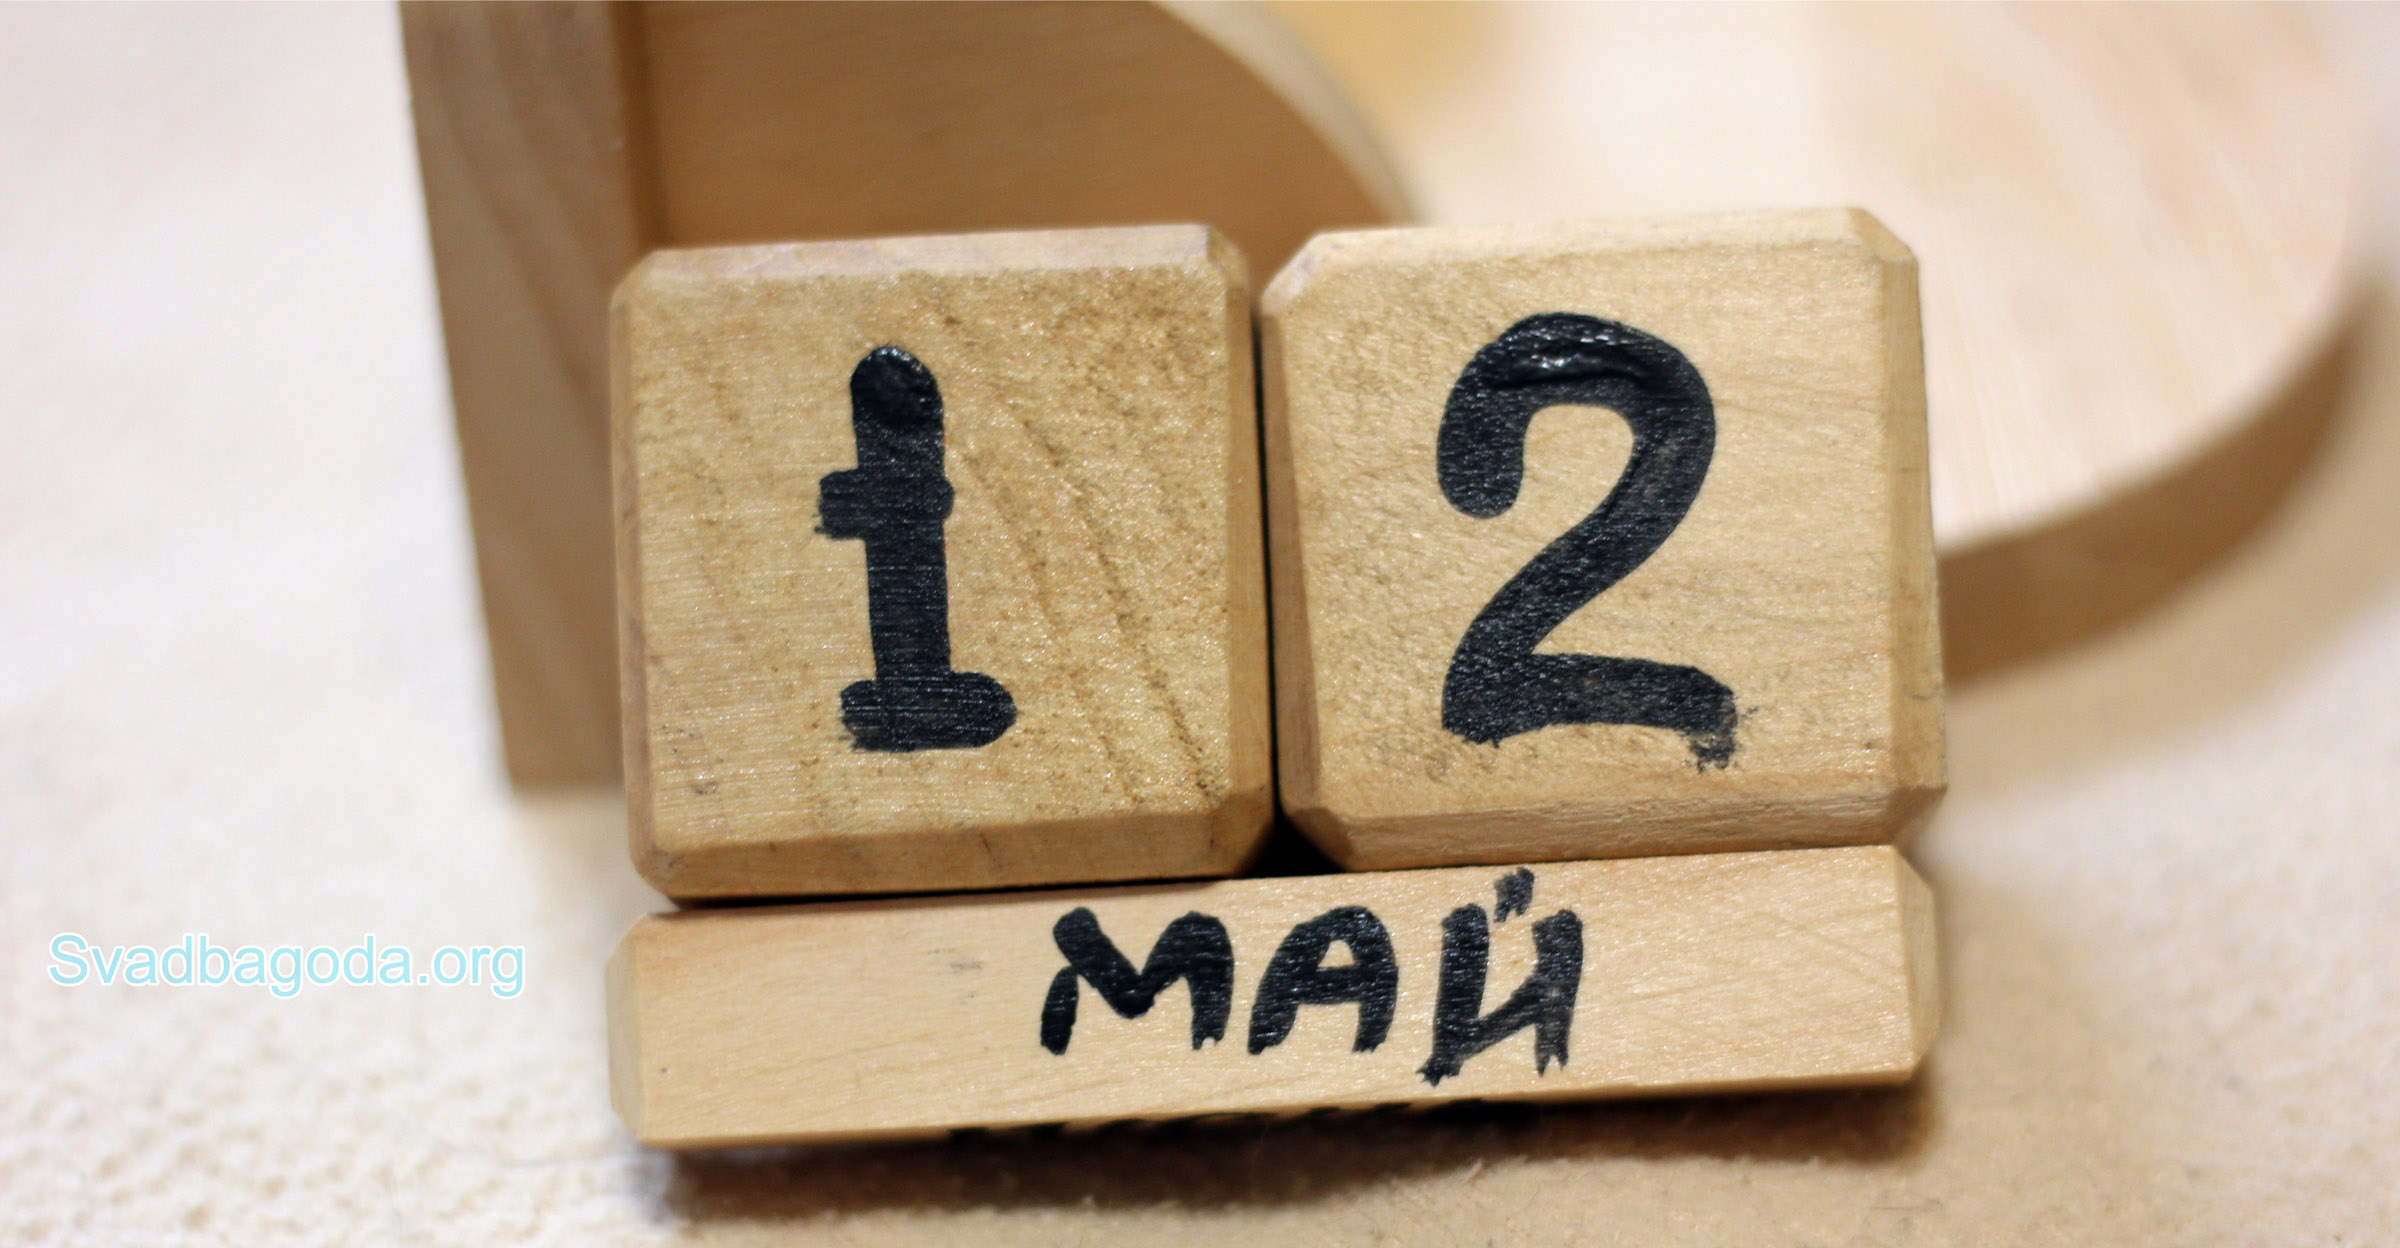 12 мая